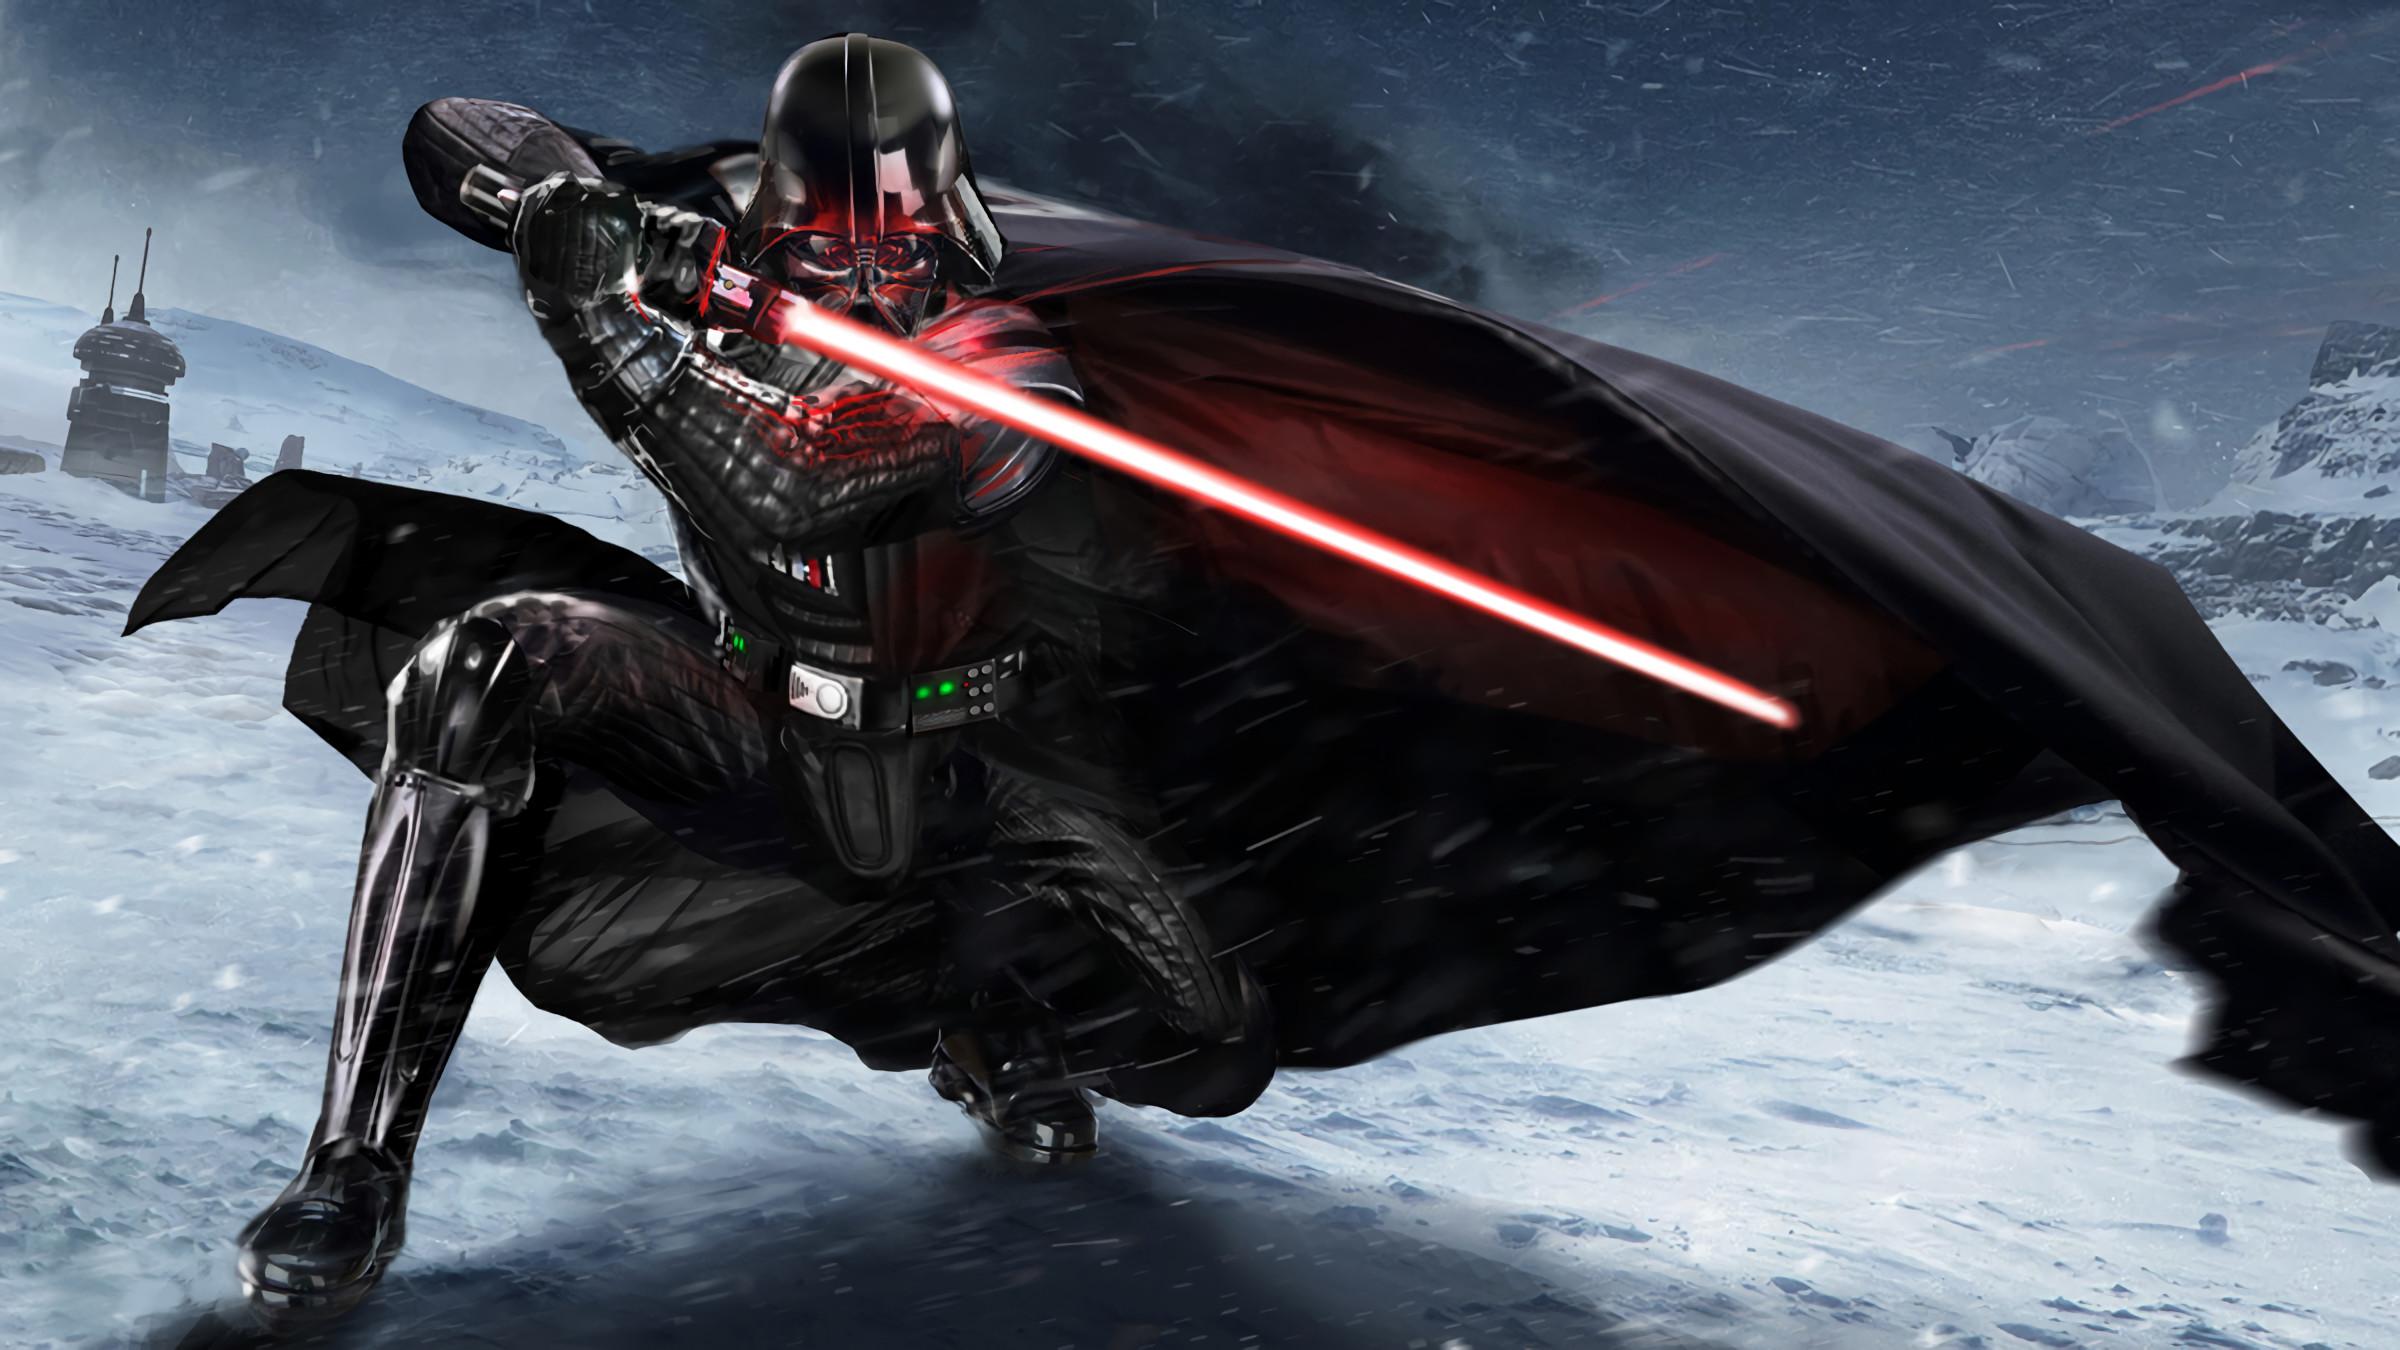 75+ Darth Vader Wallpapers on WallpaperPlay